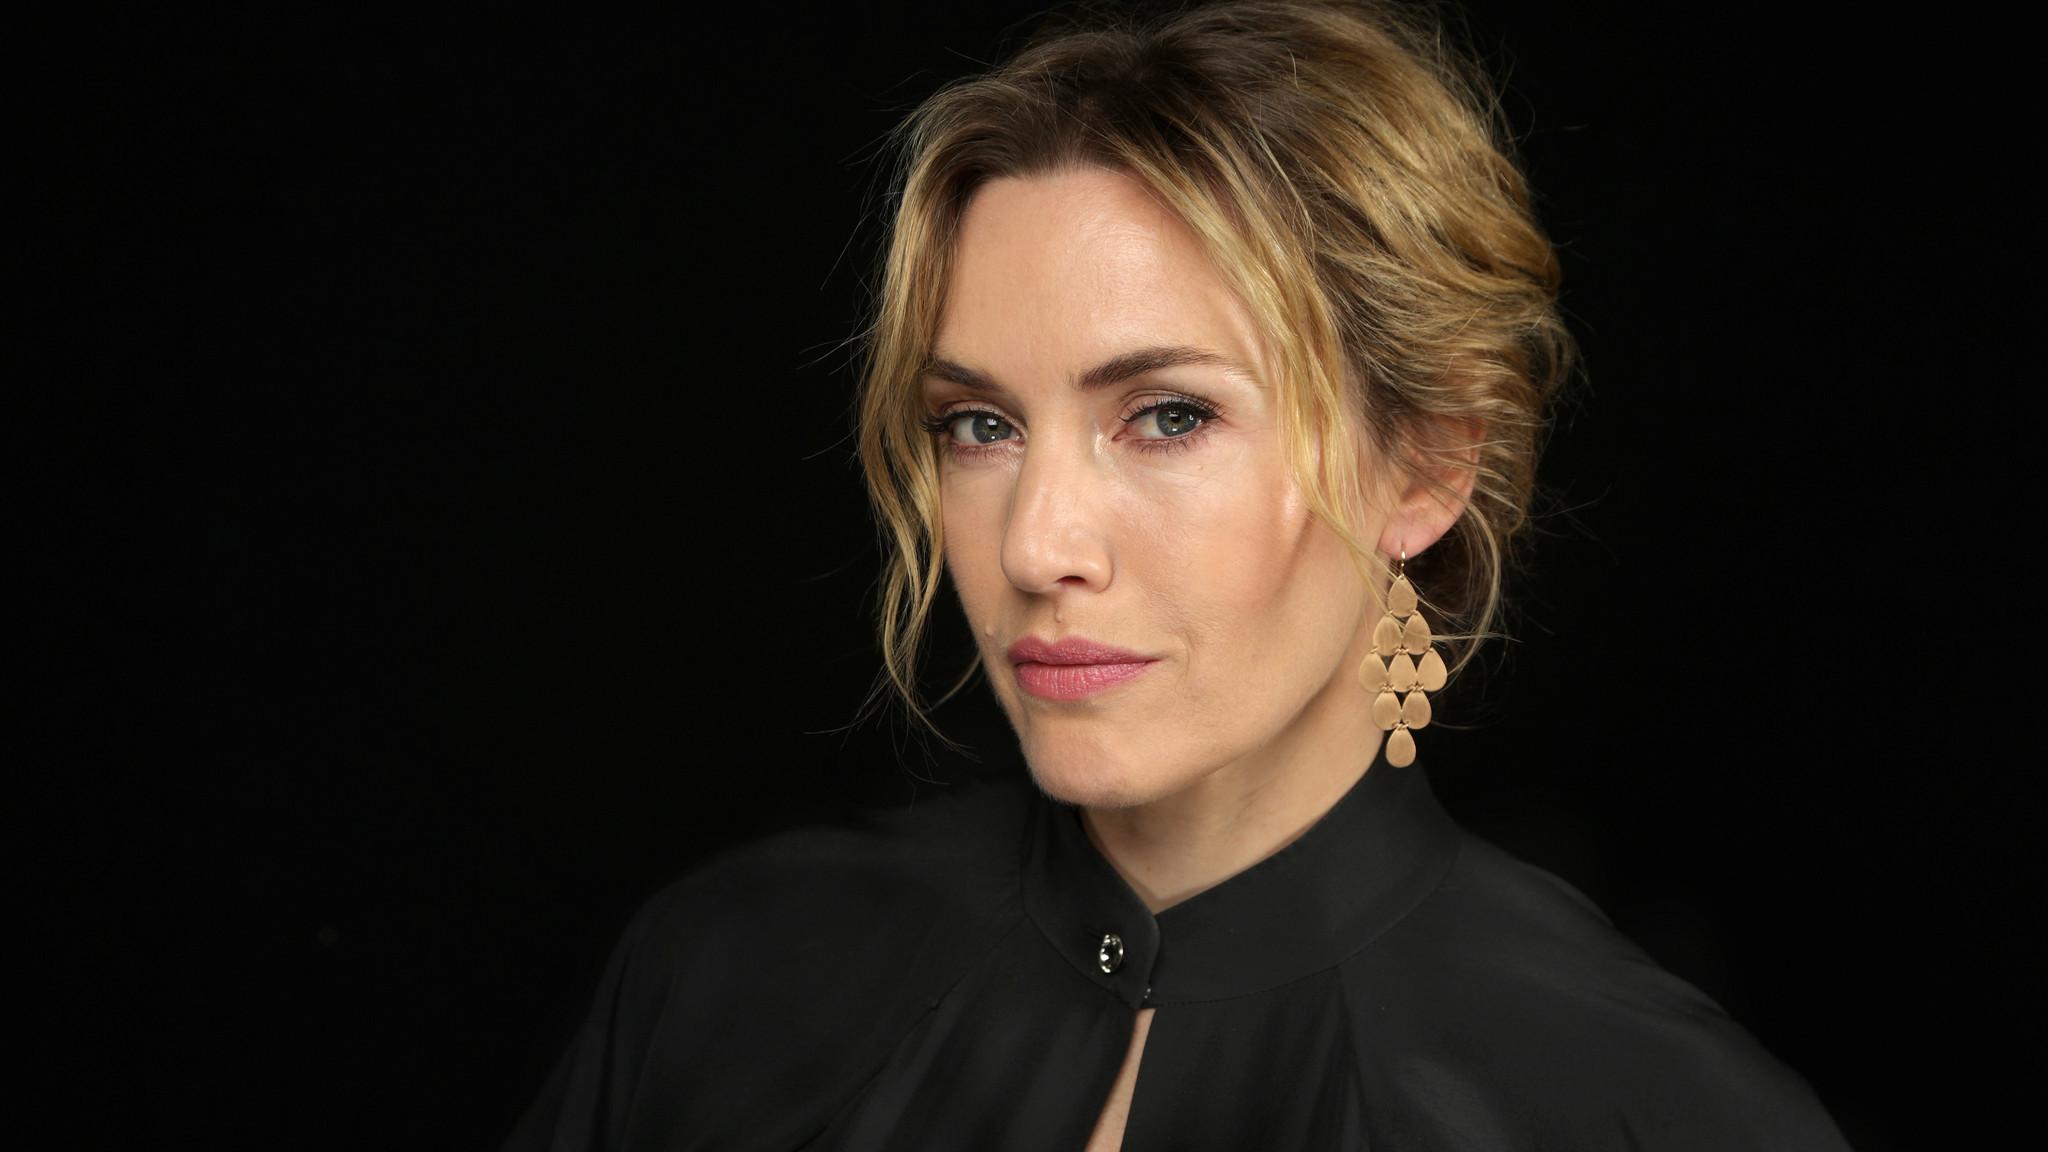 Anastasia Acosta Sexy https://www.latimes/87432782-132.html 2019-09-14 https